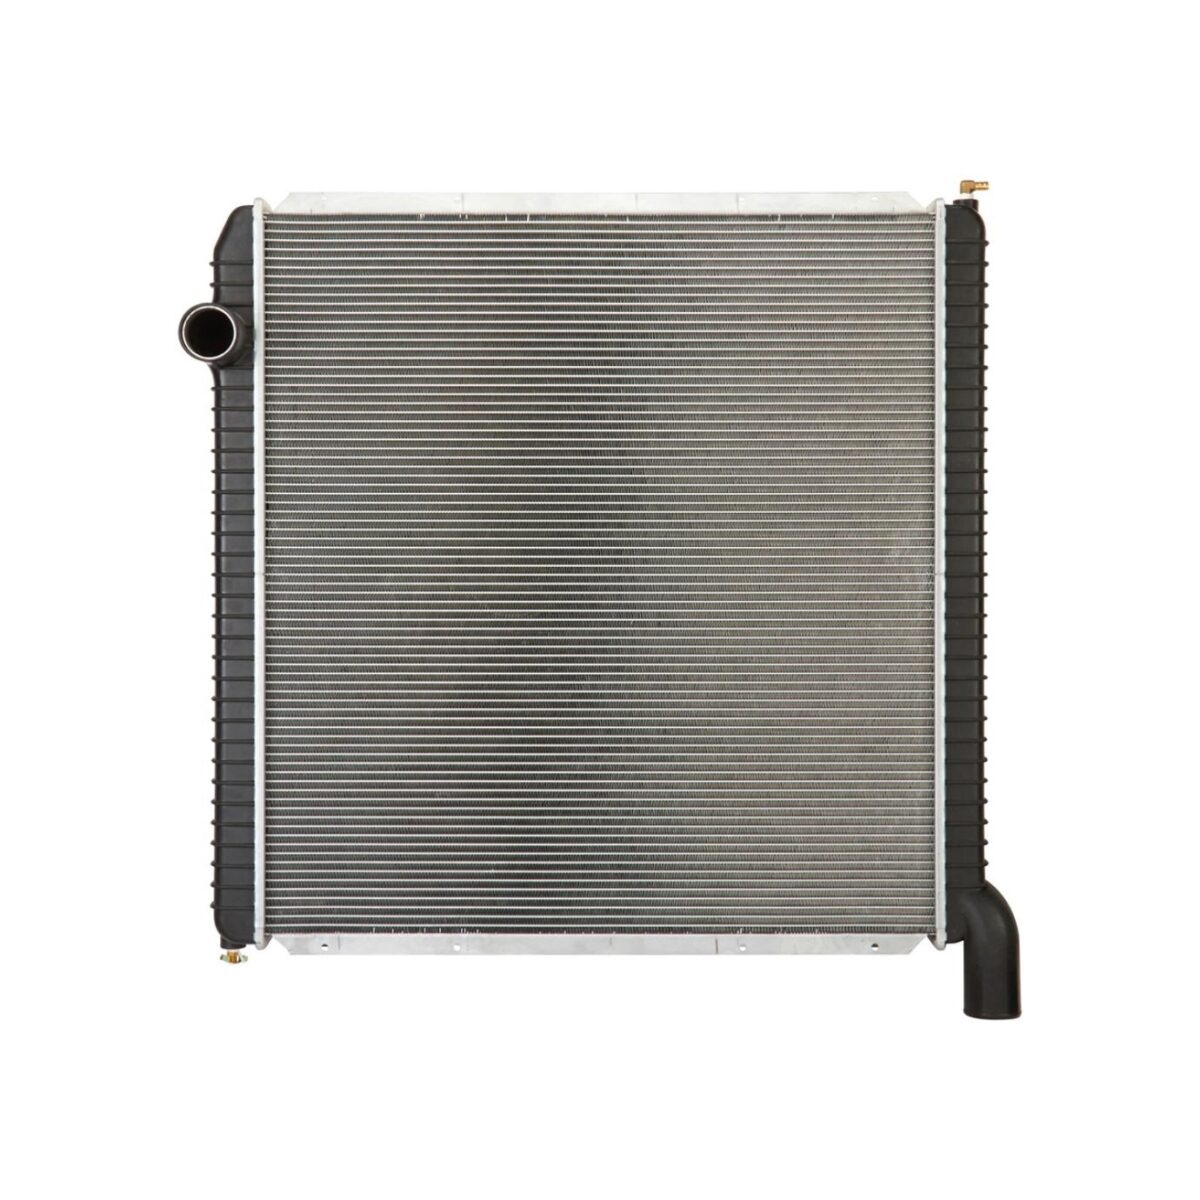 international 5000550056005900 series 04 09 radiator oem 3e0100670000 3